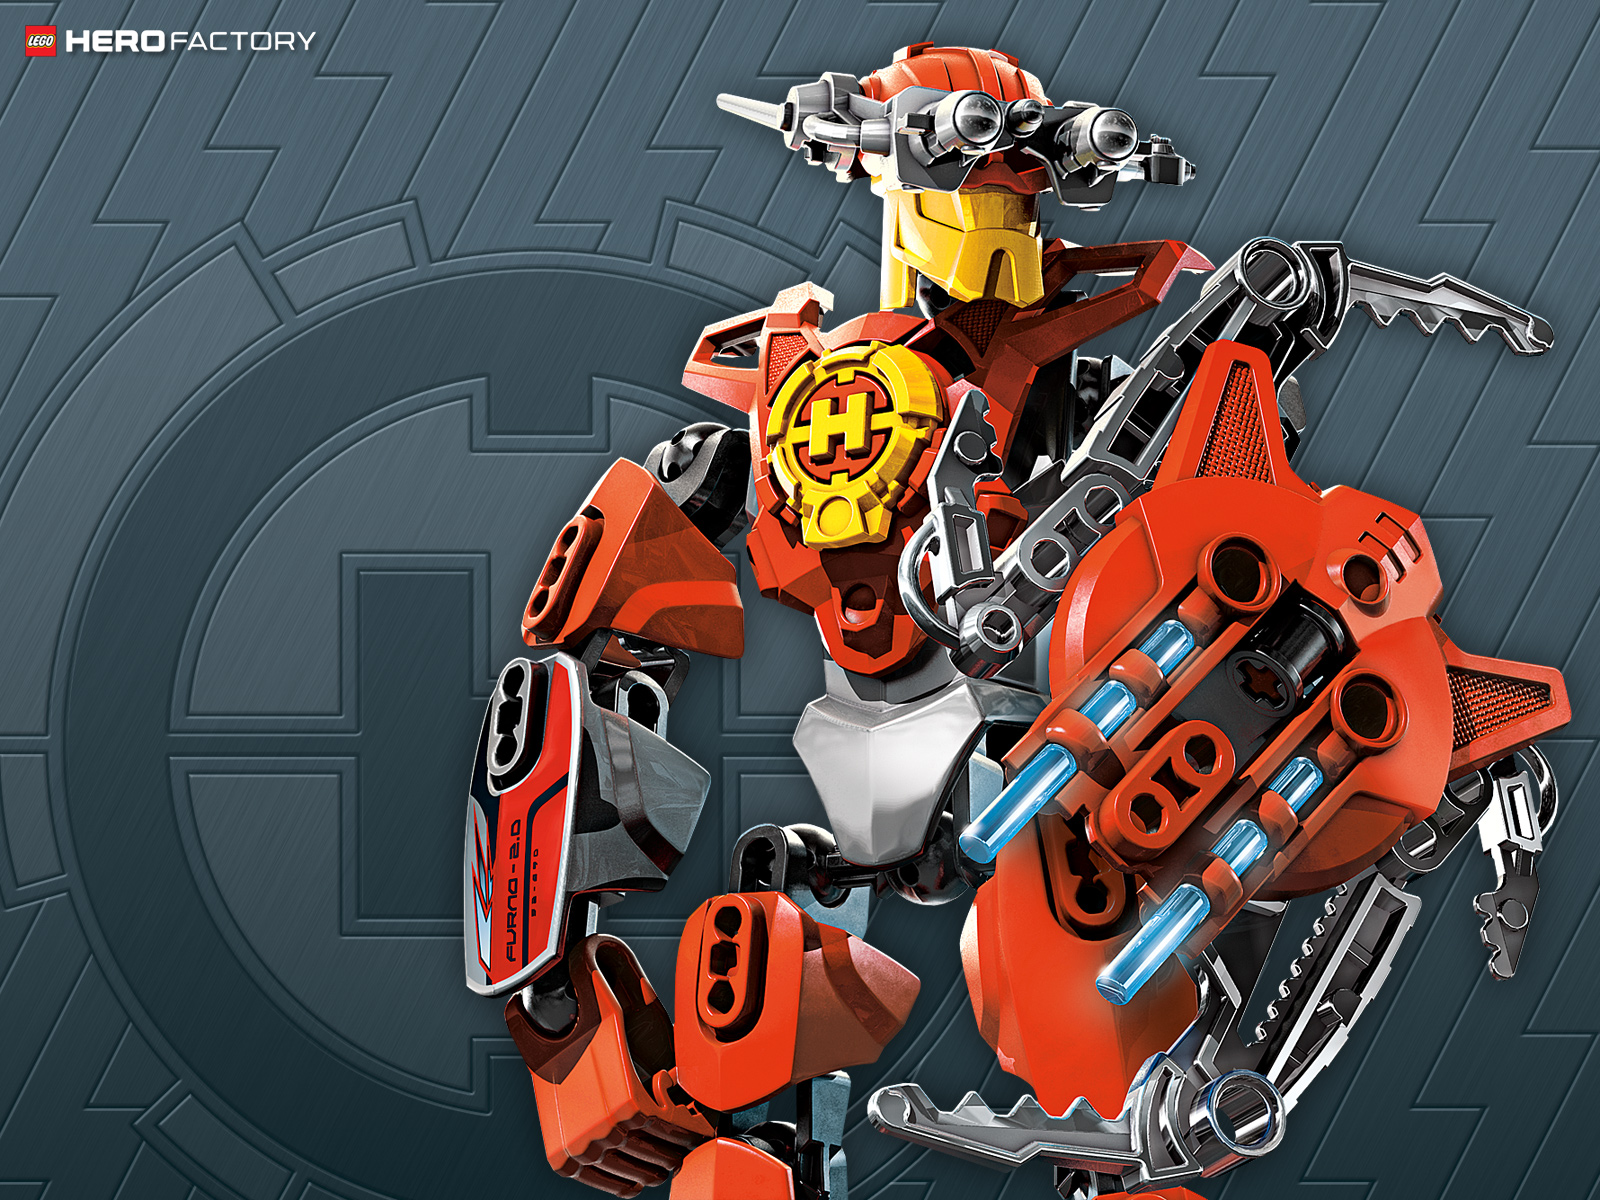 Lego herofactory tapeta and t o 1600x1200 id 499496 - Herofactory lego com gratuit ...